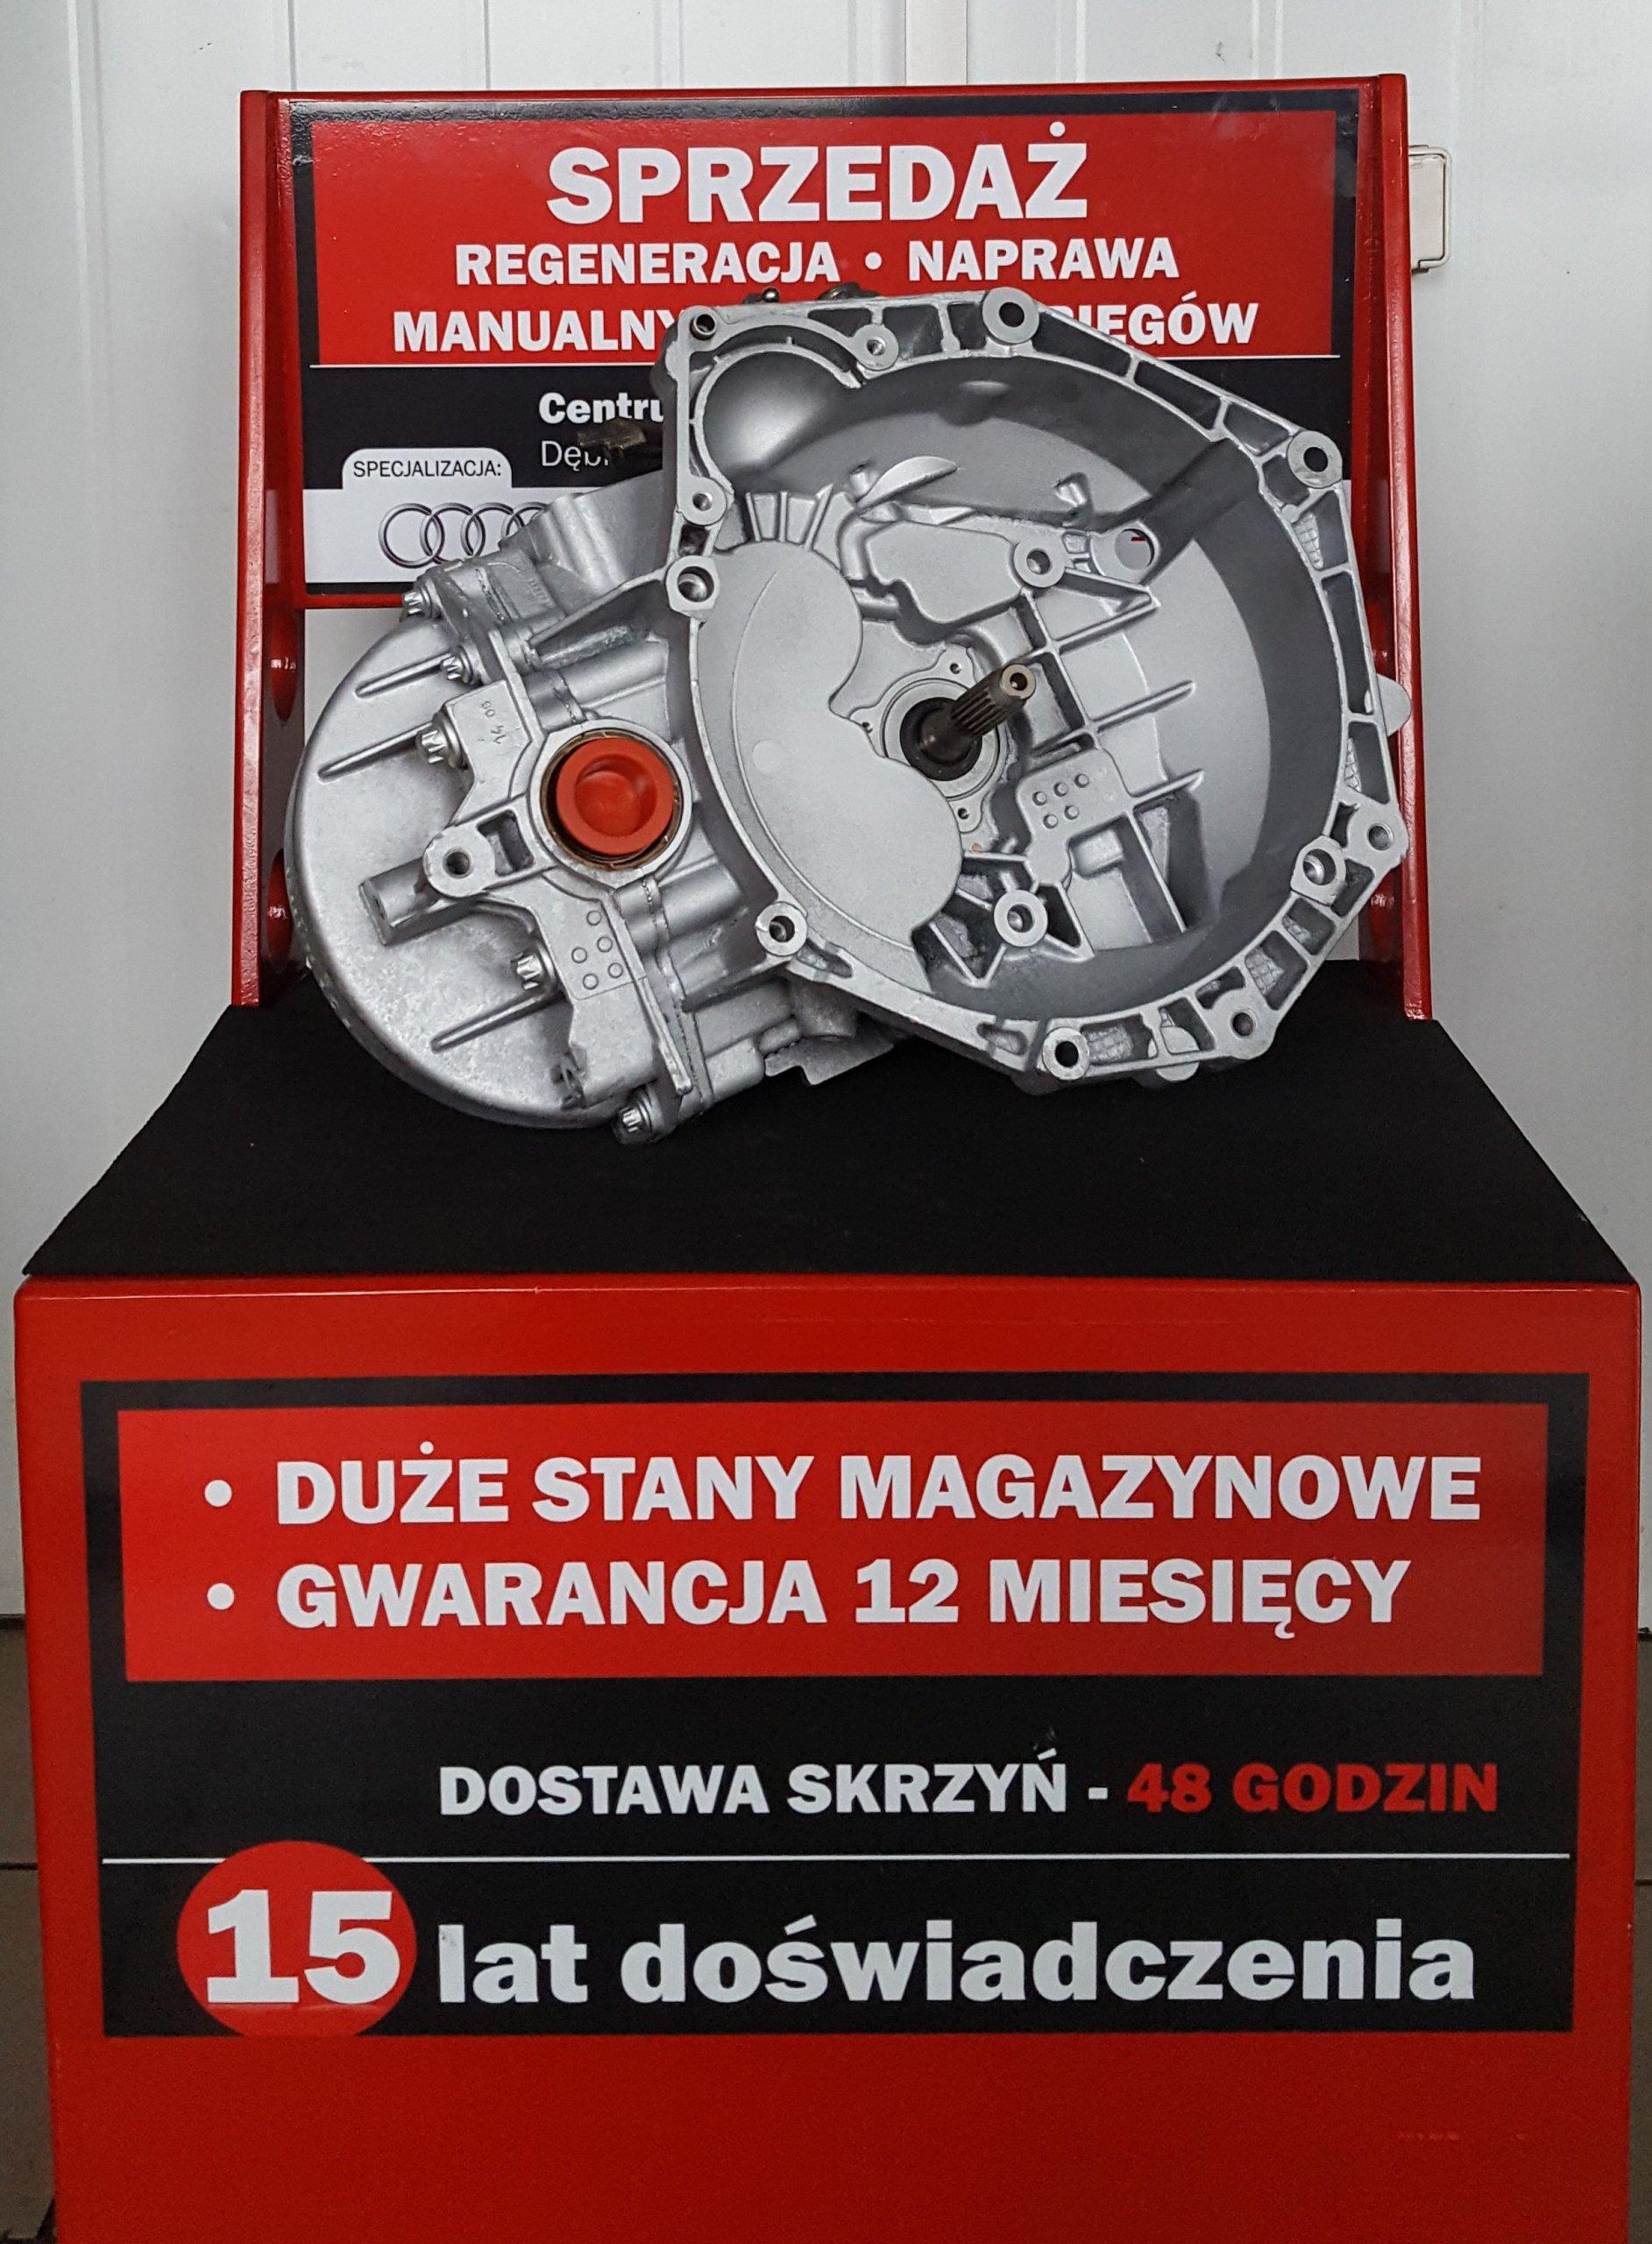 коробка 6 передач m32 opeltext=astratext=corsa zafiratext=англичанин b 19 cdti говор